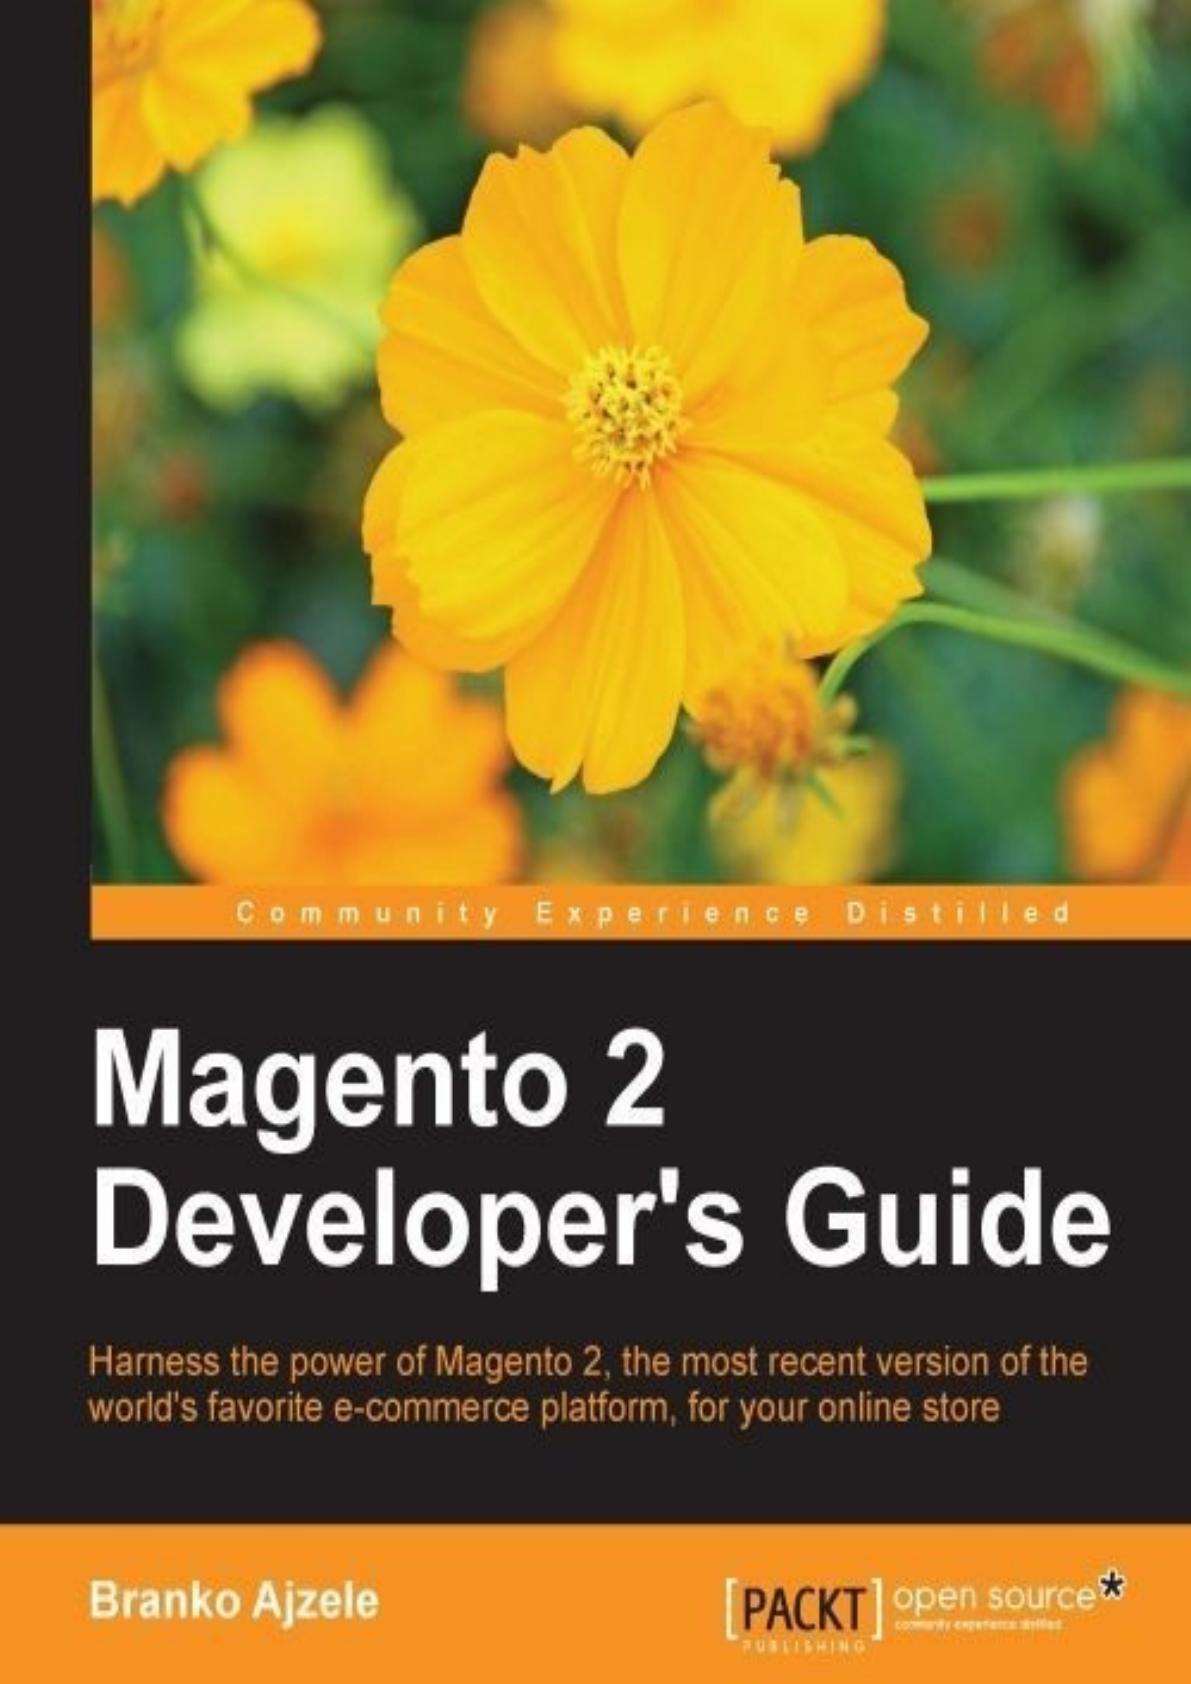 Magento 2 Developer's Guide Branko Ajzele December 2015